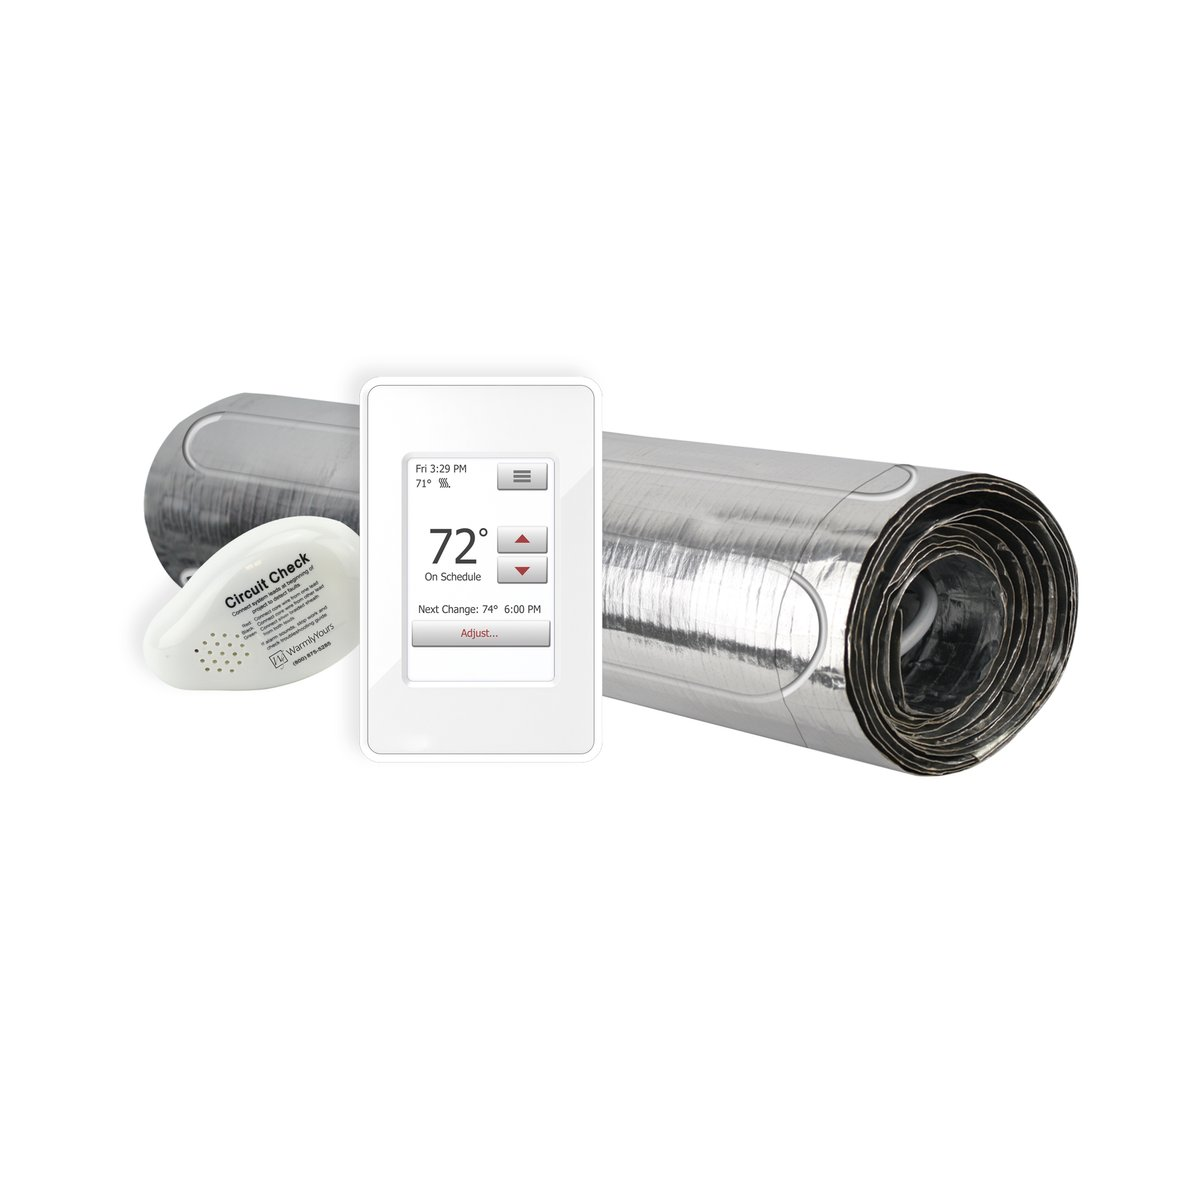 Floor Heating Kit 120V-Environ Flex Roll 1.5' x 35' + Touch Screen Thermostat ERT120-KIT-OT-1.5x35